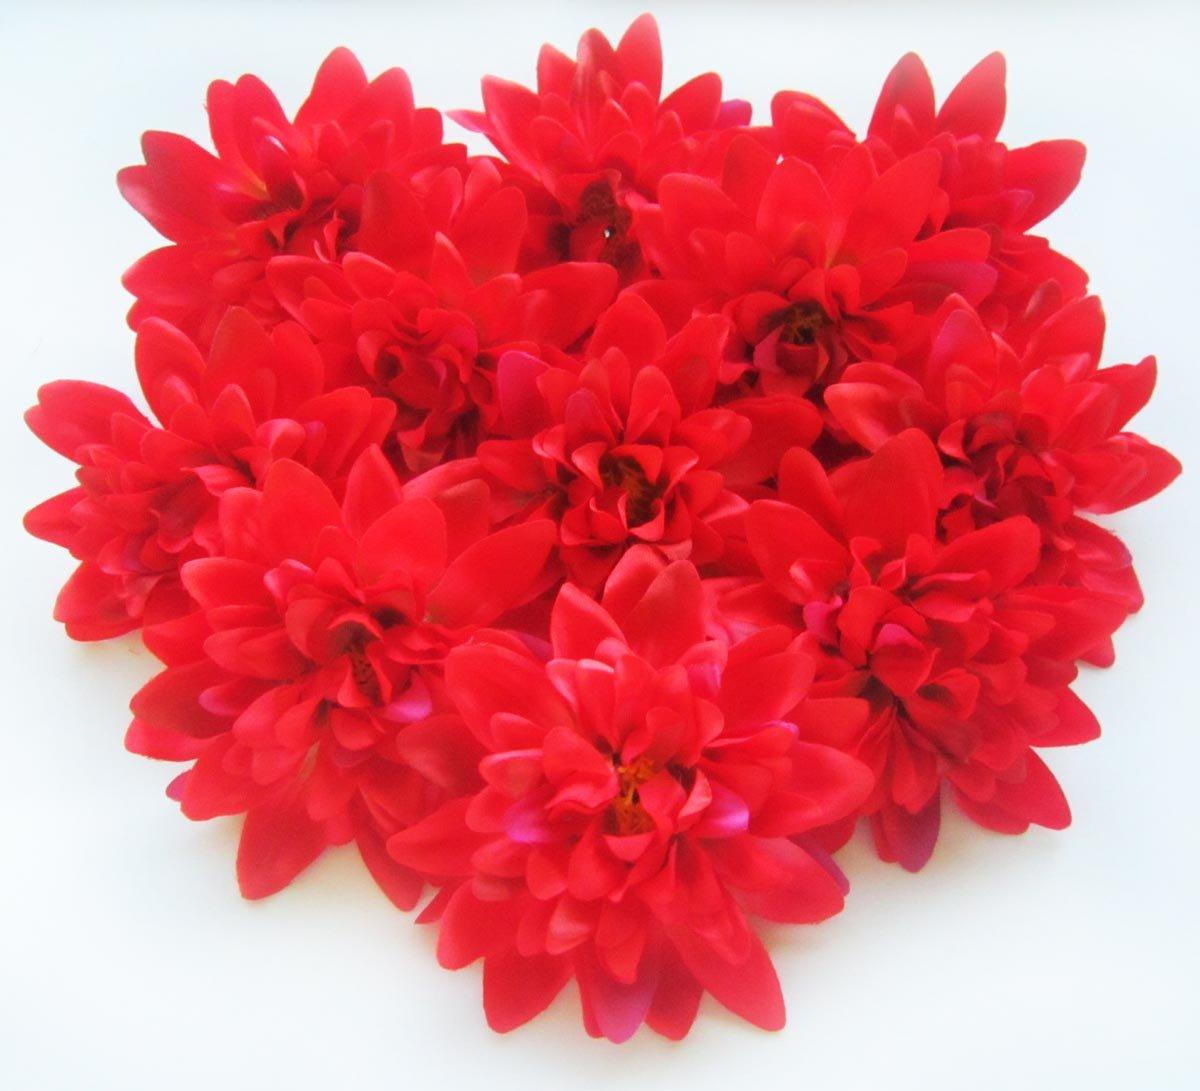 Amazon 12 red silk dahlia flower heads 4 artificial amazon 12 red silk dahlia flower heads 4 artificial flowers dahlias head fabric floral supplies wholesale lot for wedding flowers accessories izmirmasajfo